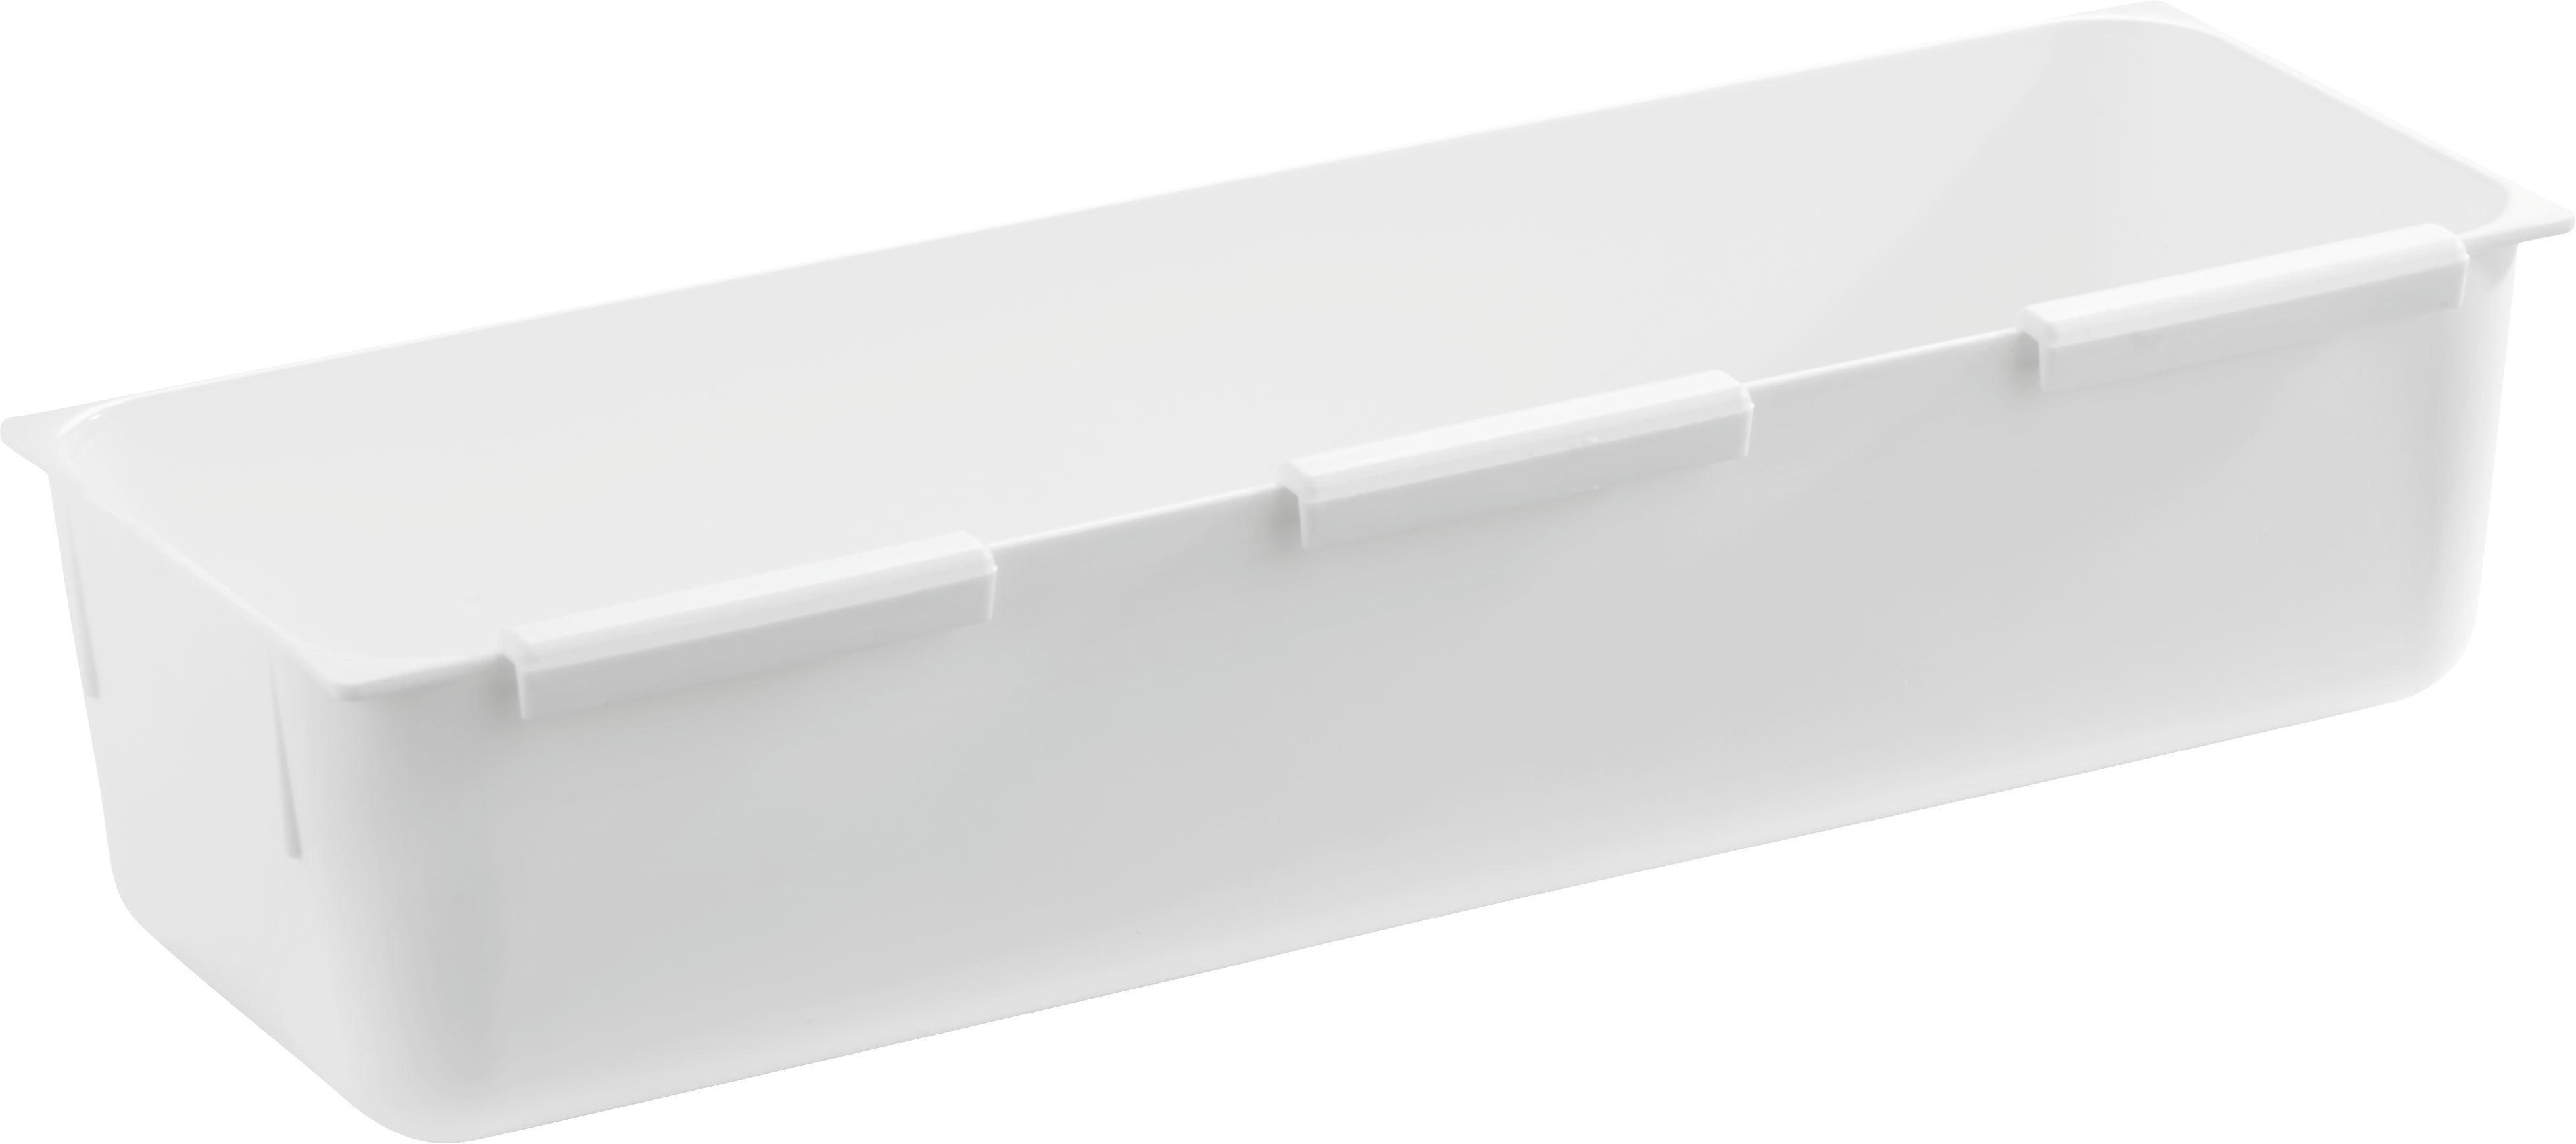 Schubladenbox Wanda in Weiß, ca. 7,5x22,5cm - Weiß, Kunststoff (7,5/22,5cm)